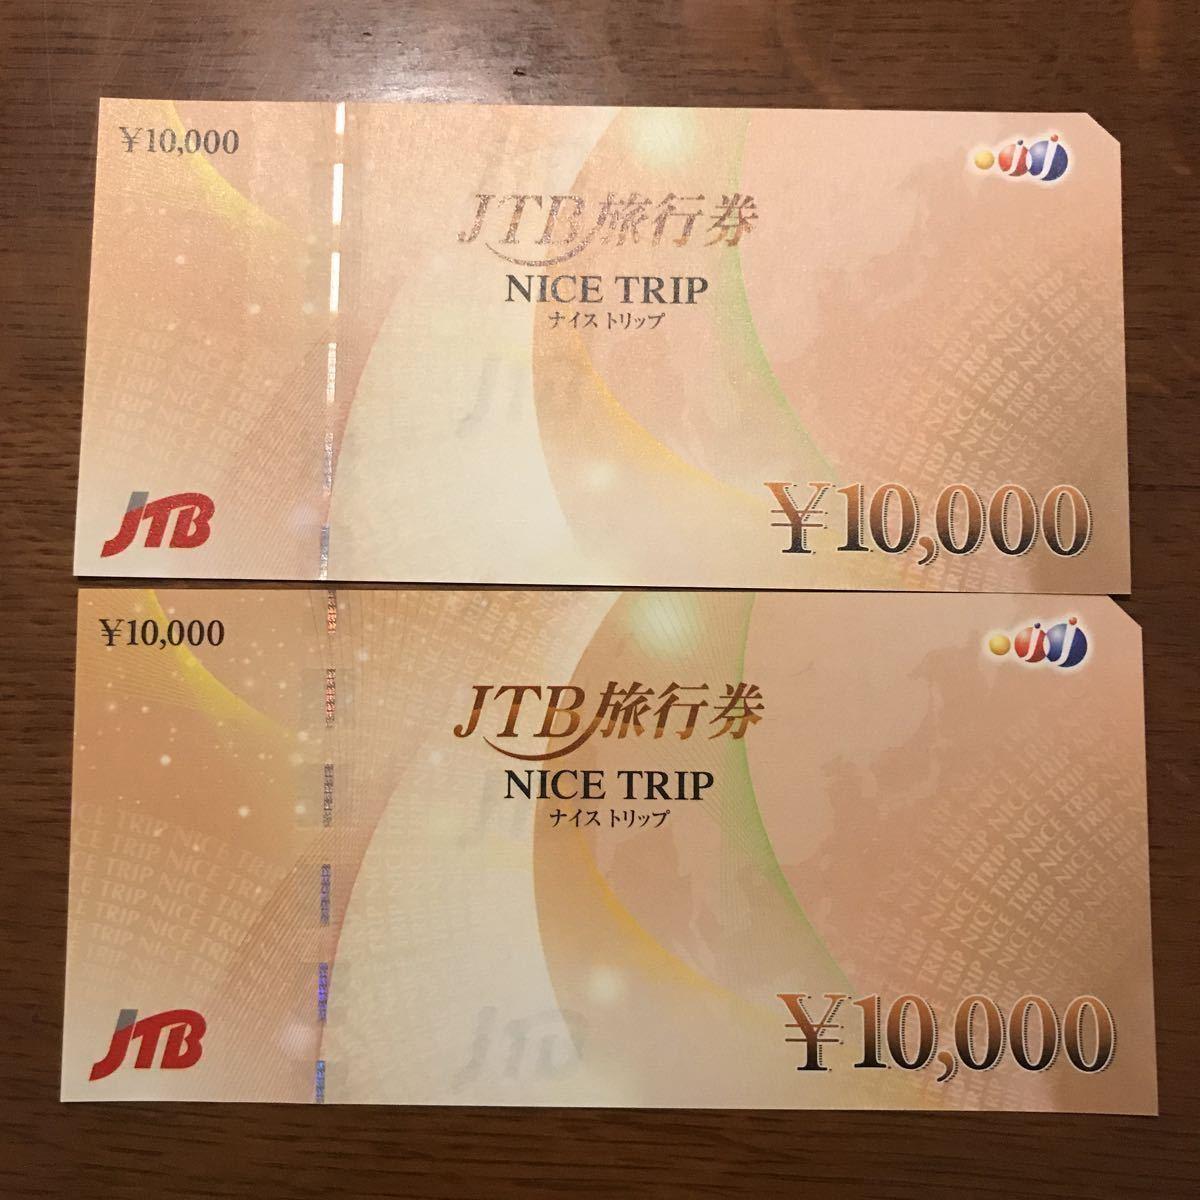 JTB 旅行券 2枚(20000円分)_画像1